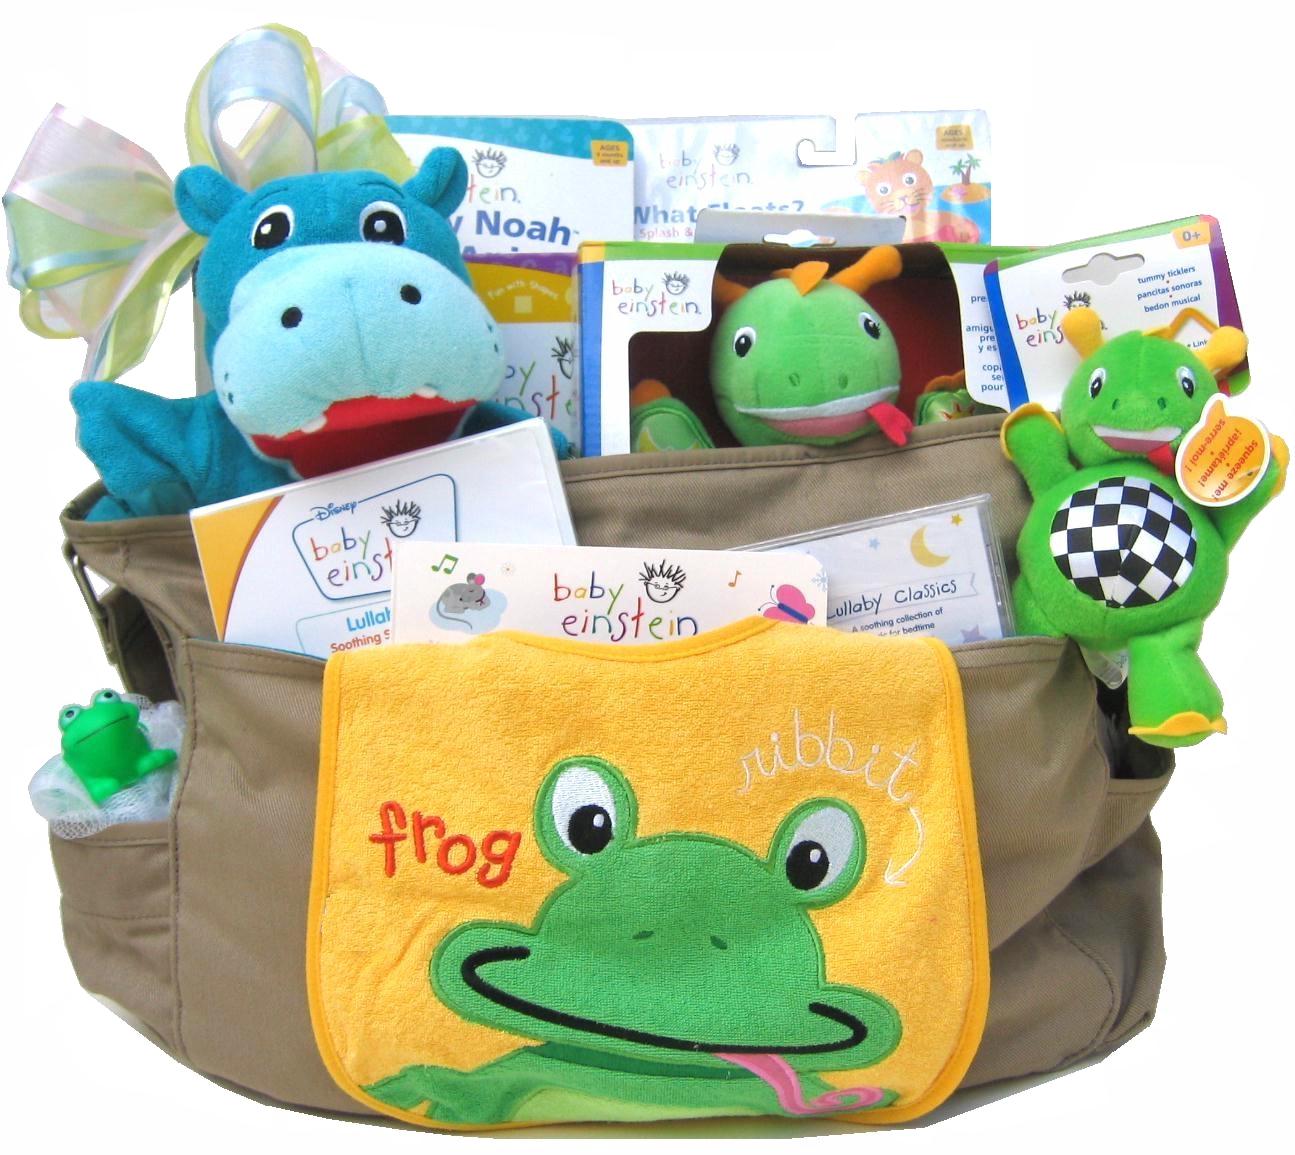 baby book gift basket: